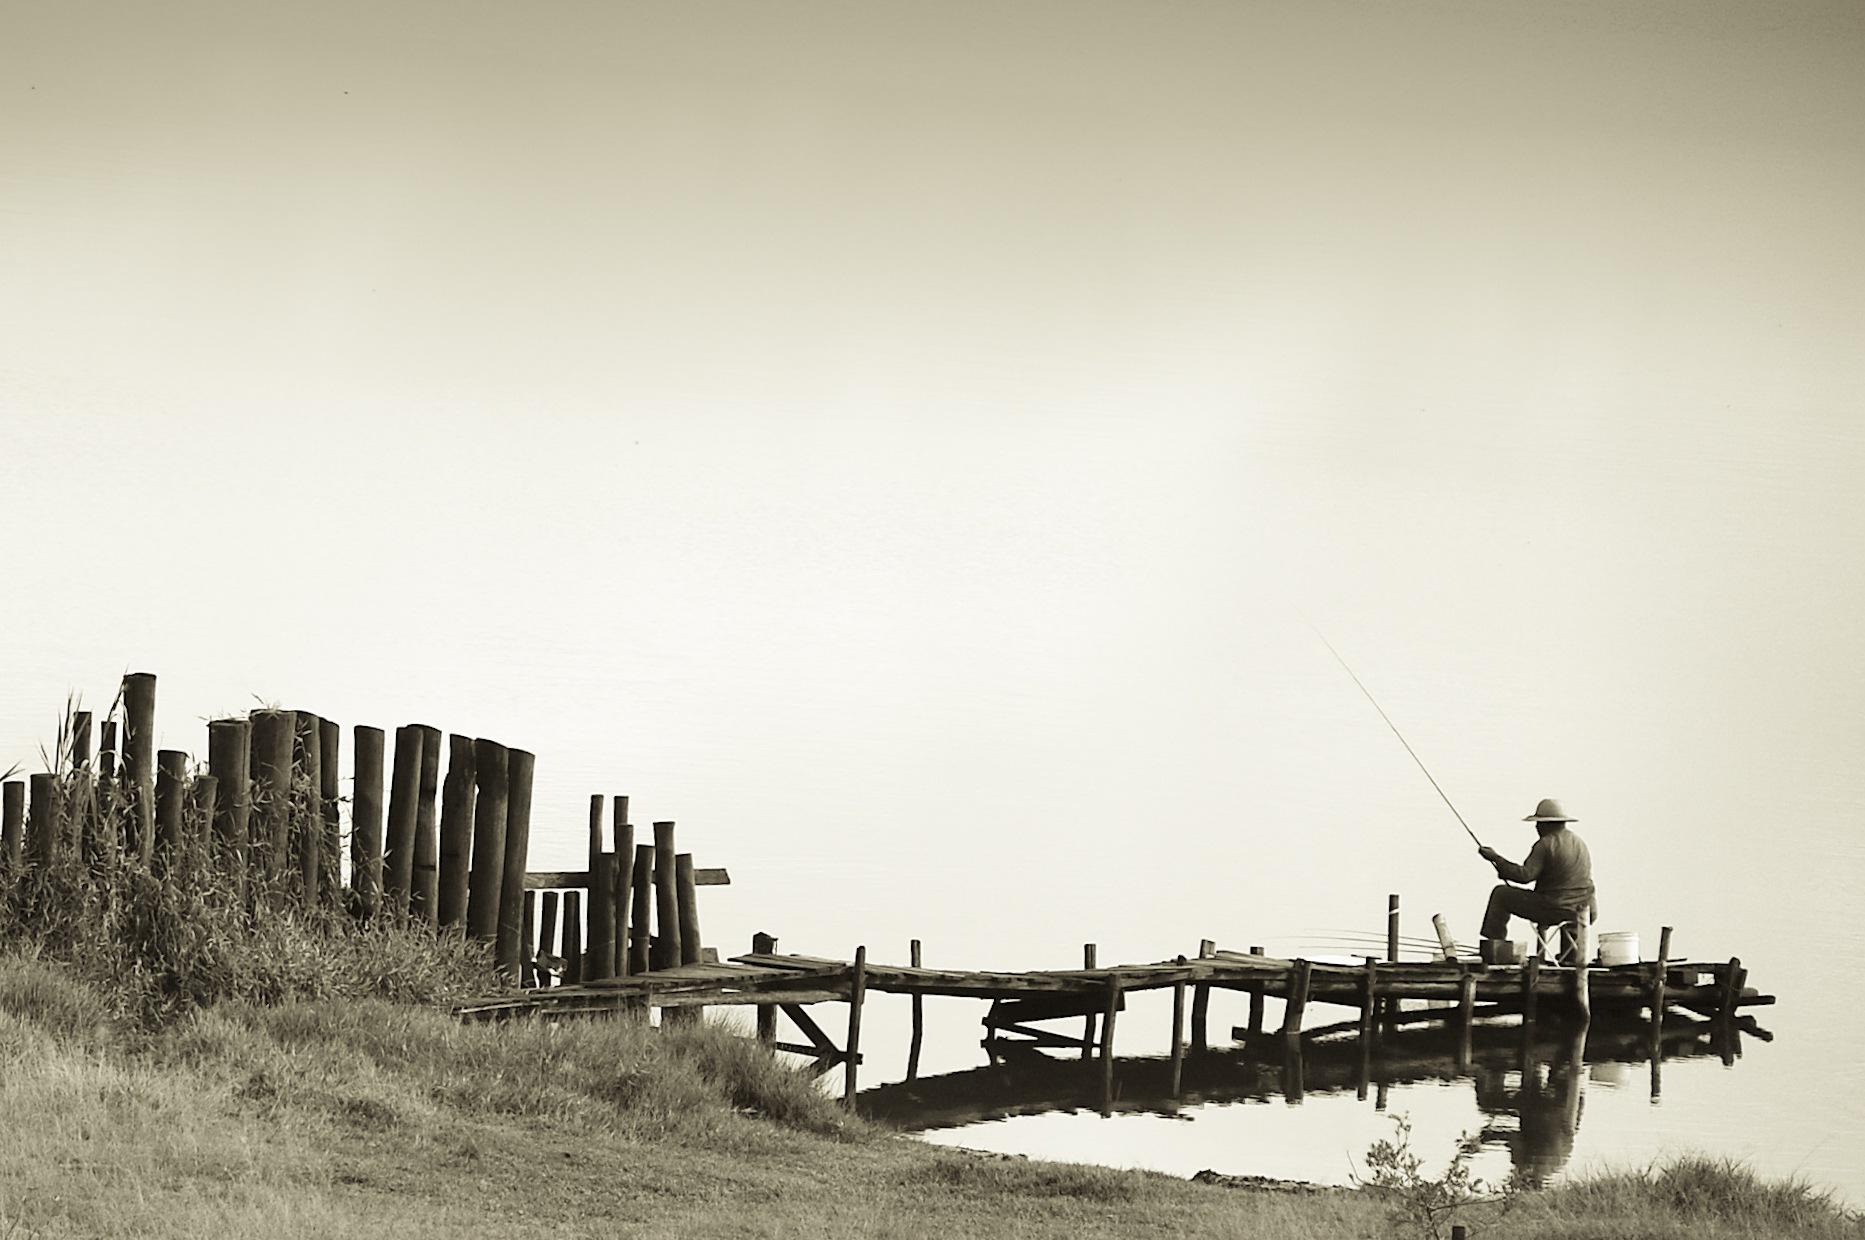 Fisherman by BileCarbonero